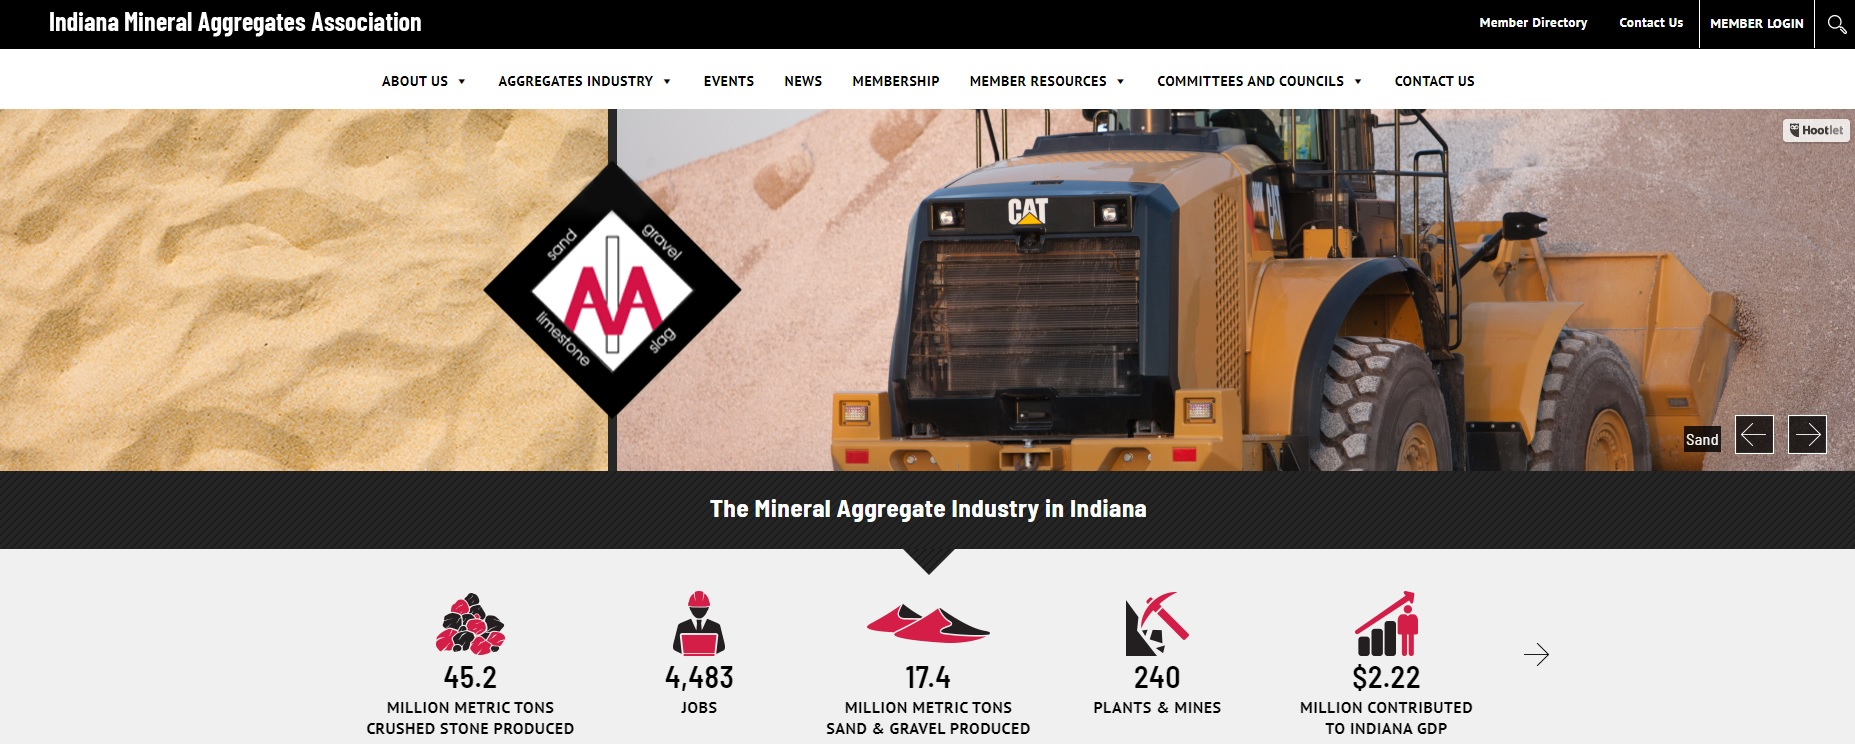 New IMAA Website